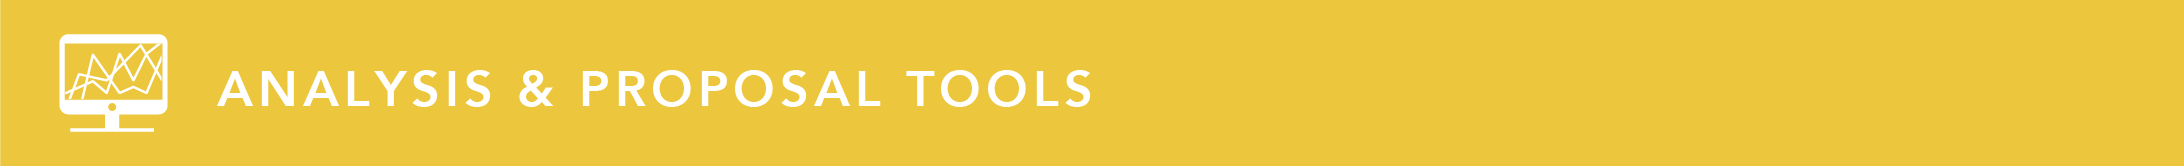 Analysis & Proposal Tools.png